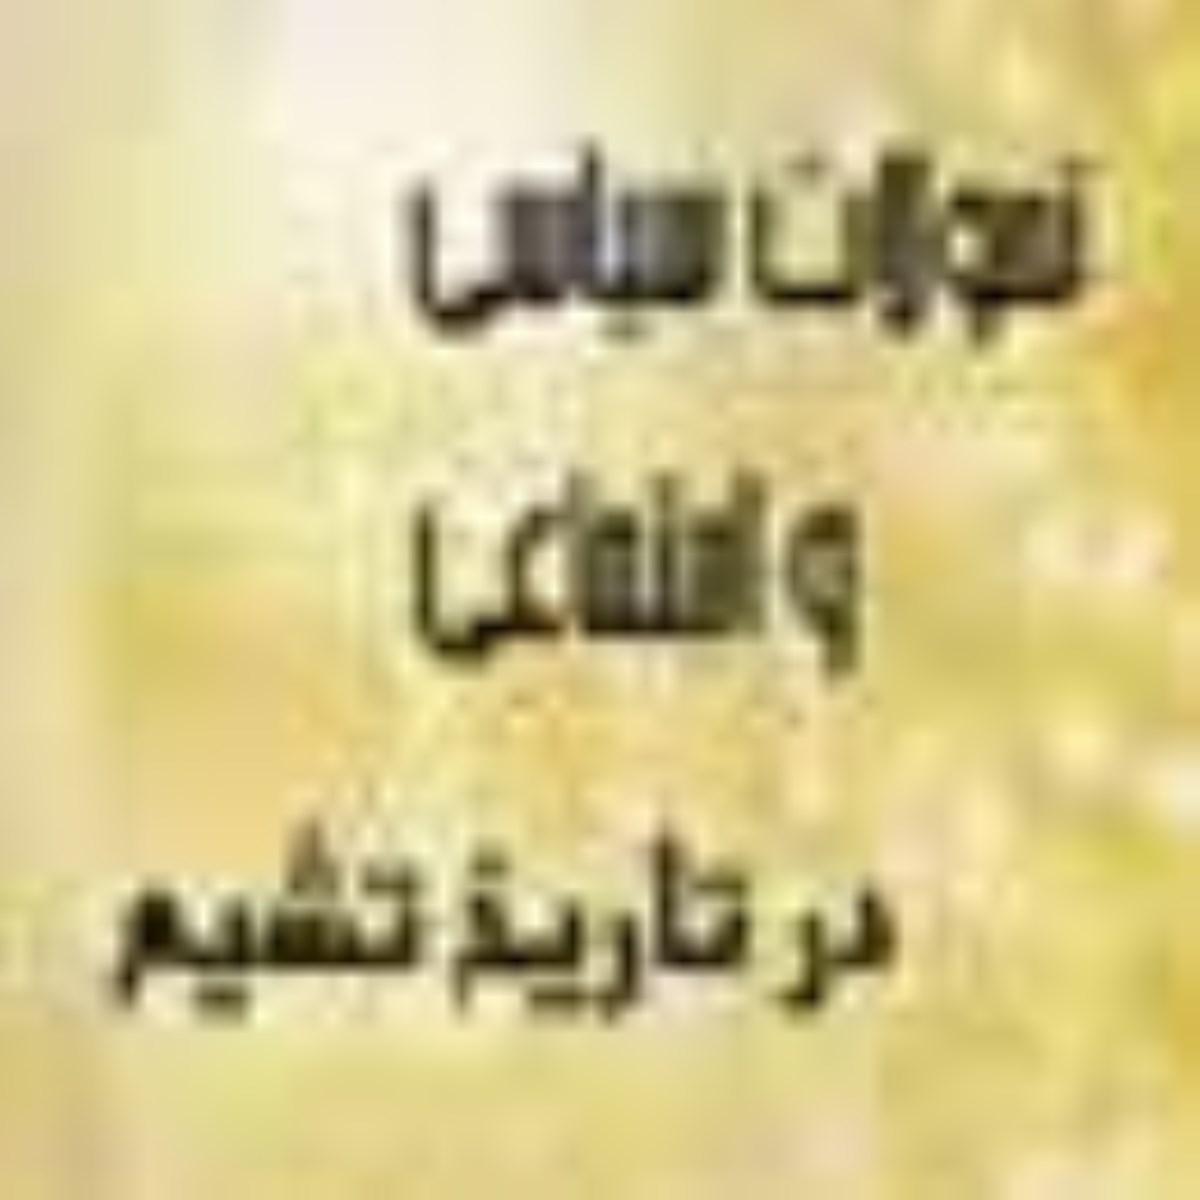 تحولات سياسى و اجتماعى در تاريخ تشيع